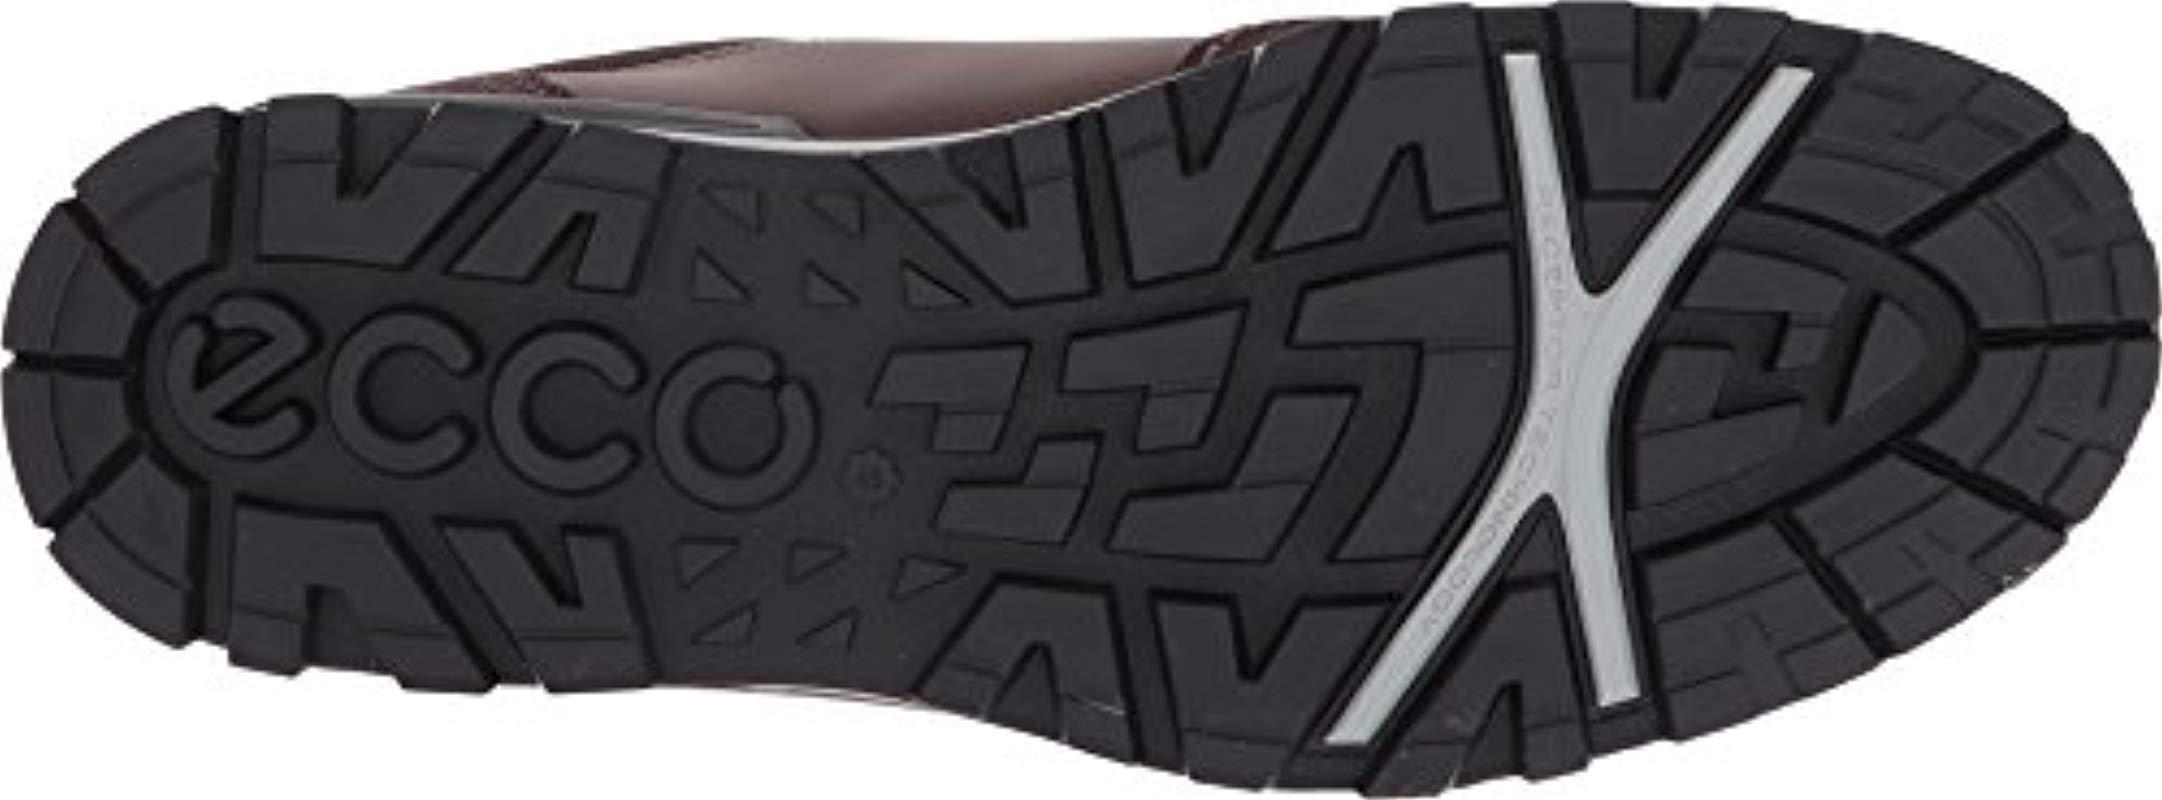 Oregon Retro Sneaker Hiking Boot